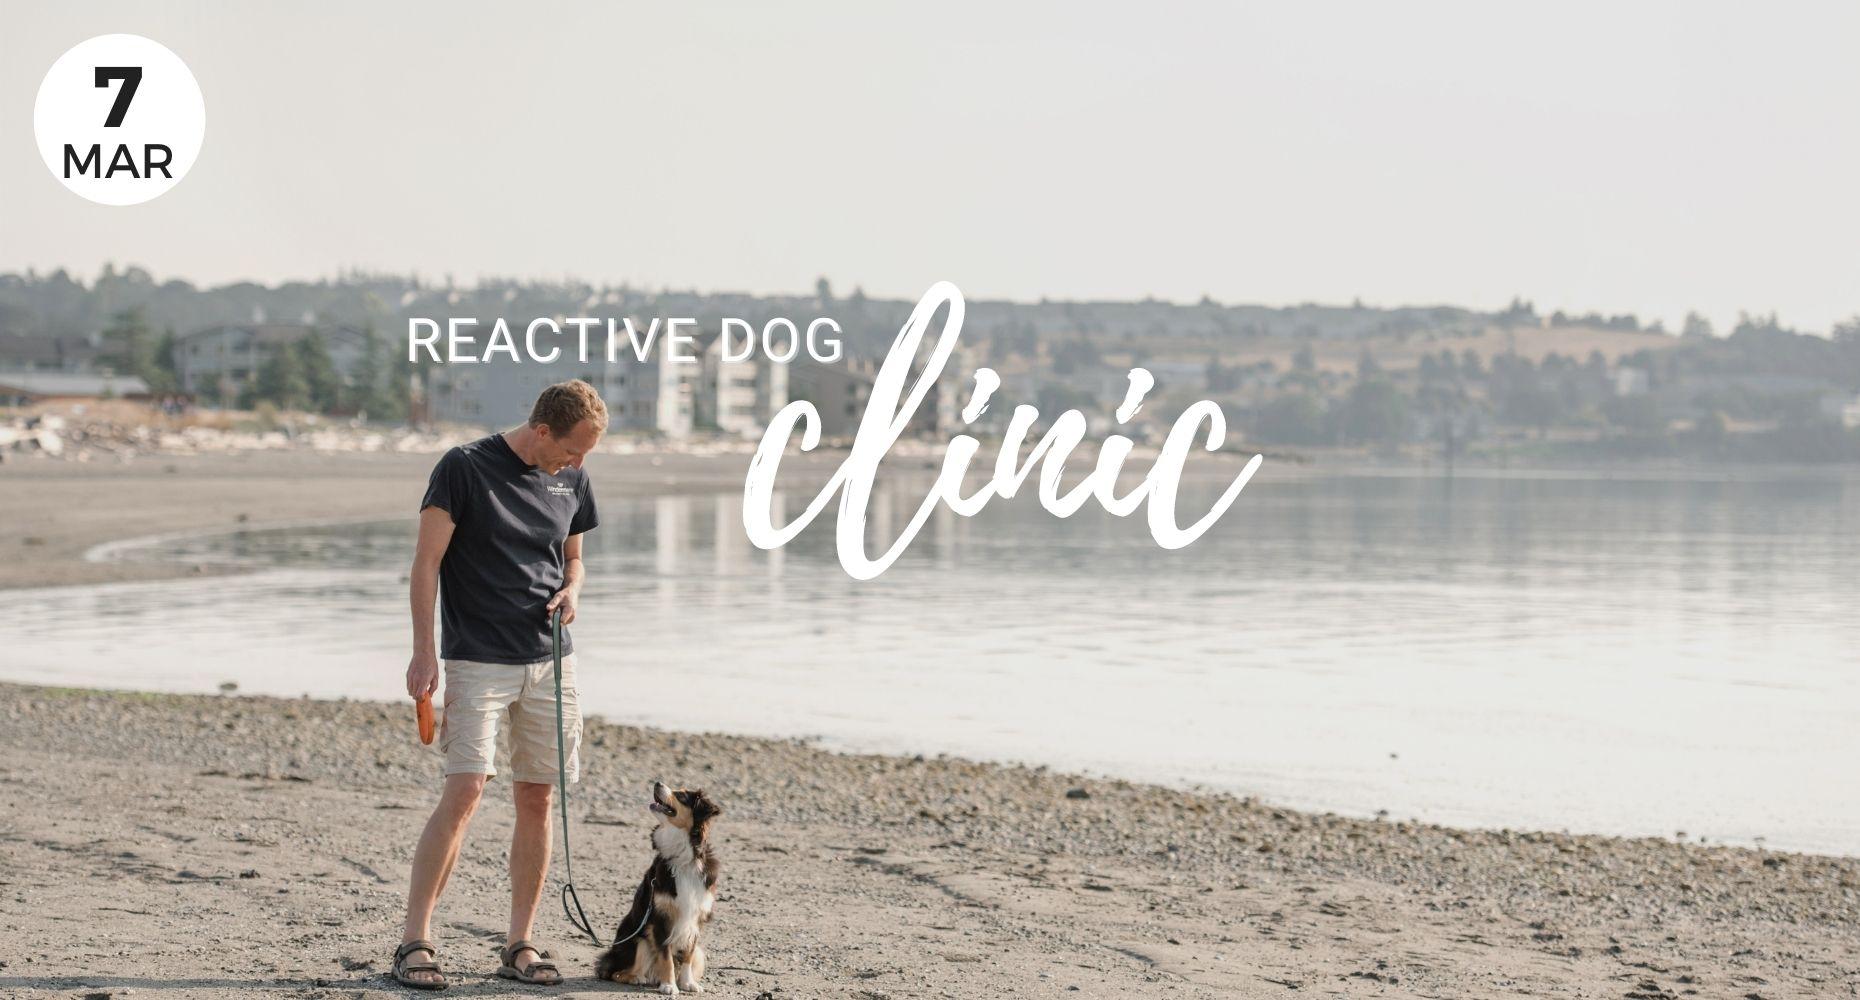 Reactive dog Clinic